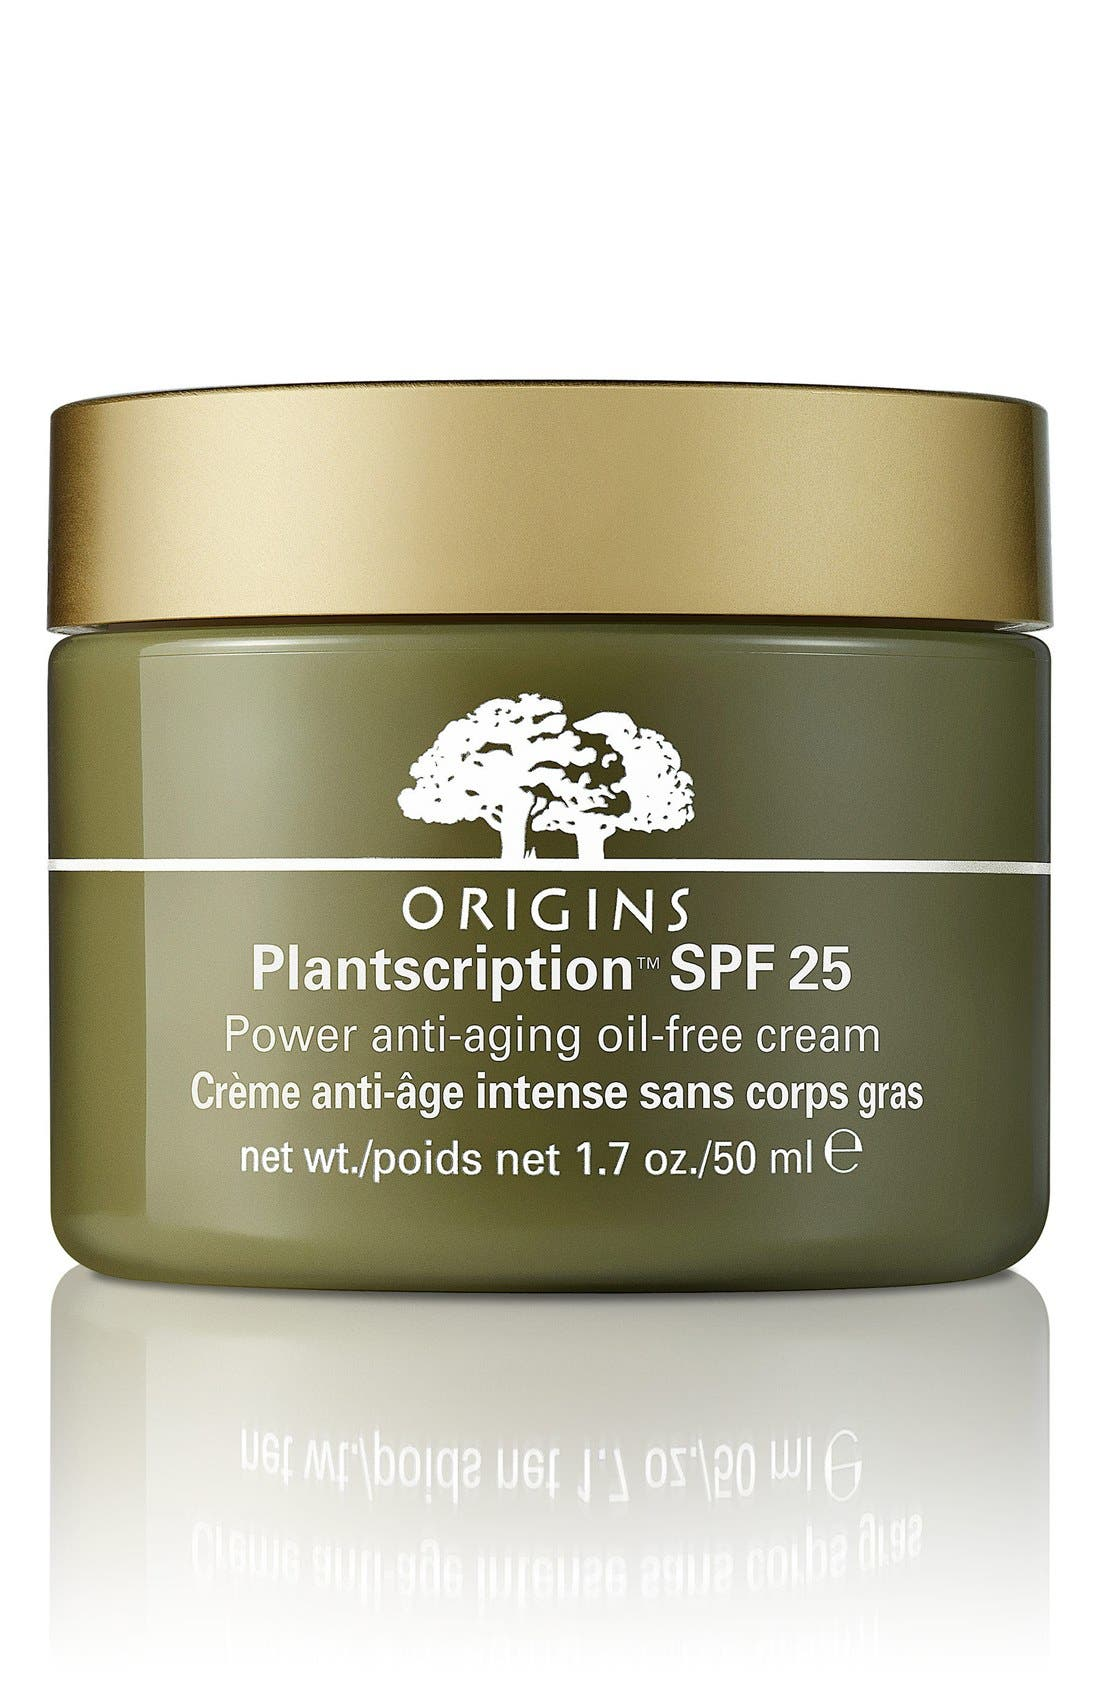 Origins Plantscription™ SPF 25 Power Anti-Aging Oil-Free Cream